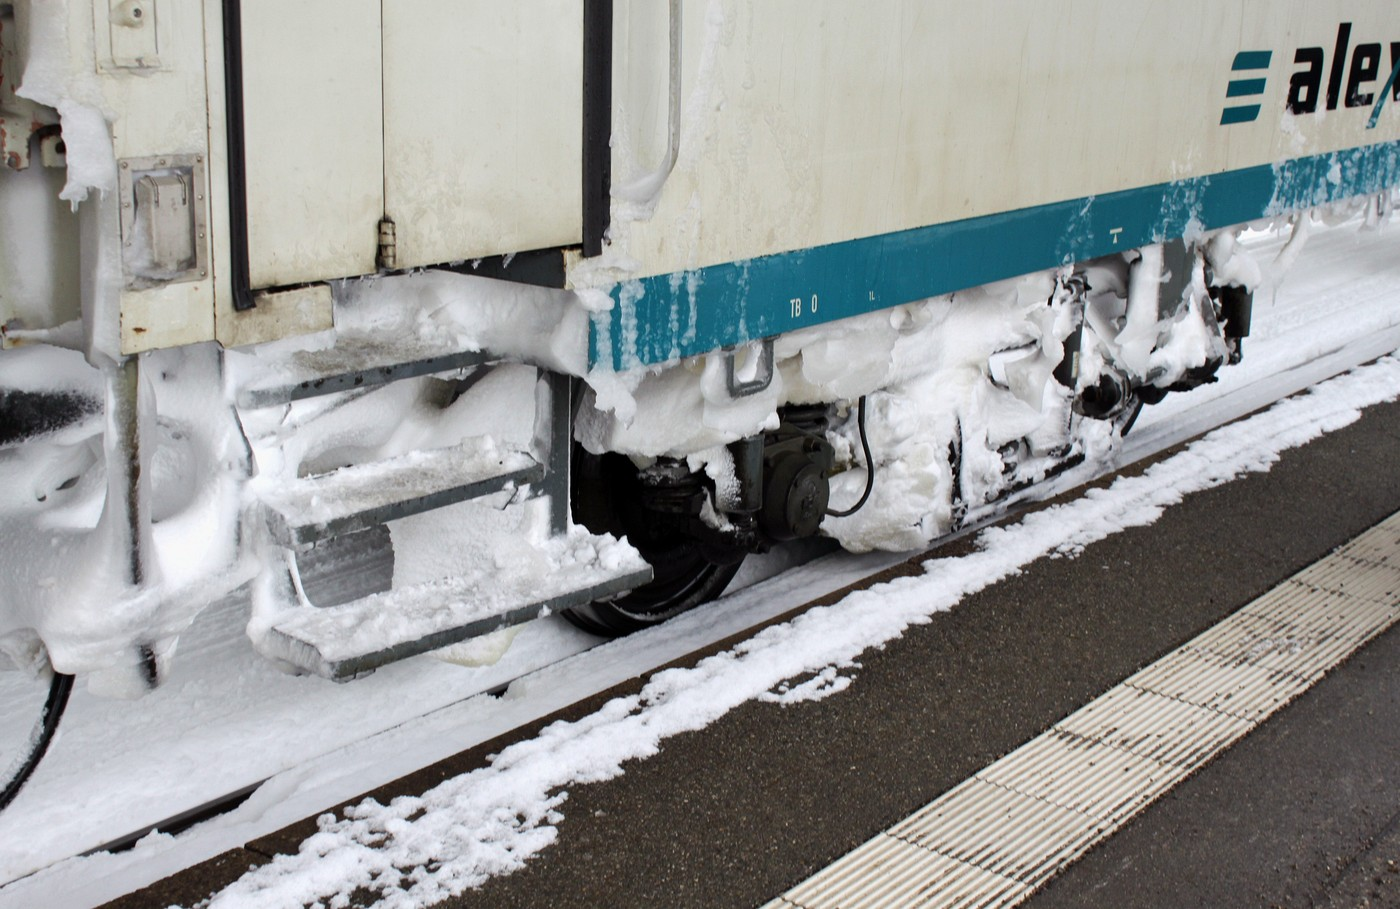 http://www.eisenbahn-im-bild.de/Temp/D_13_Oberstd_IMG_8750.jpg